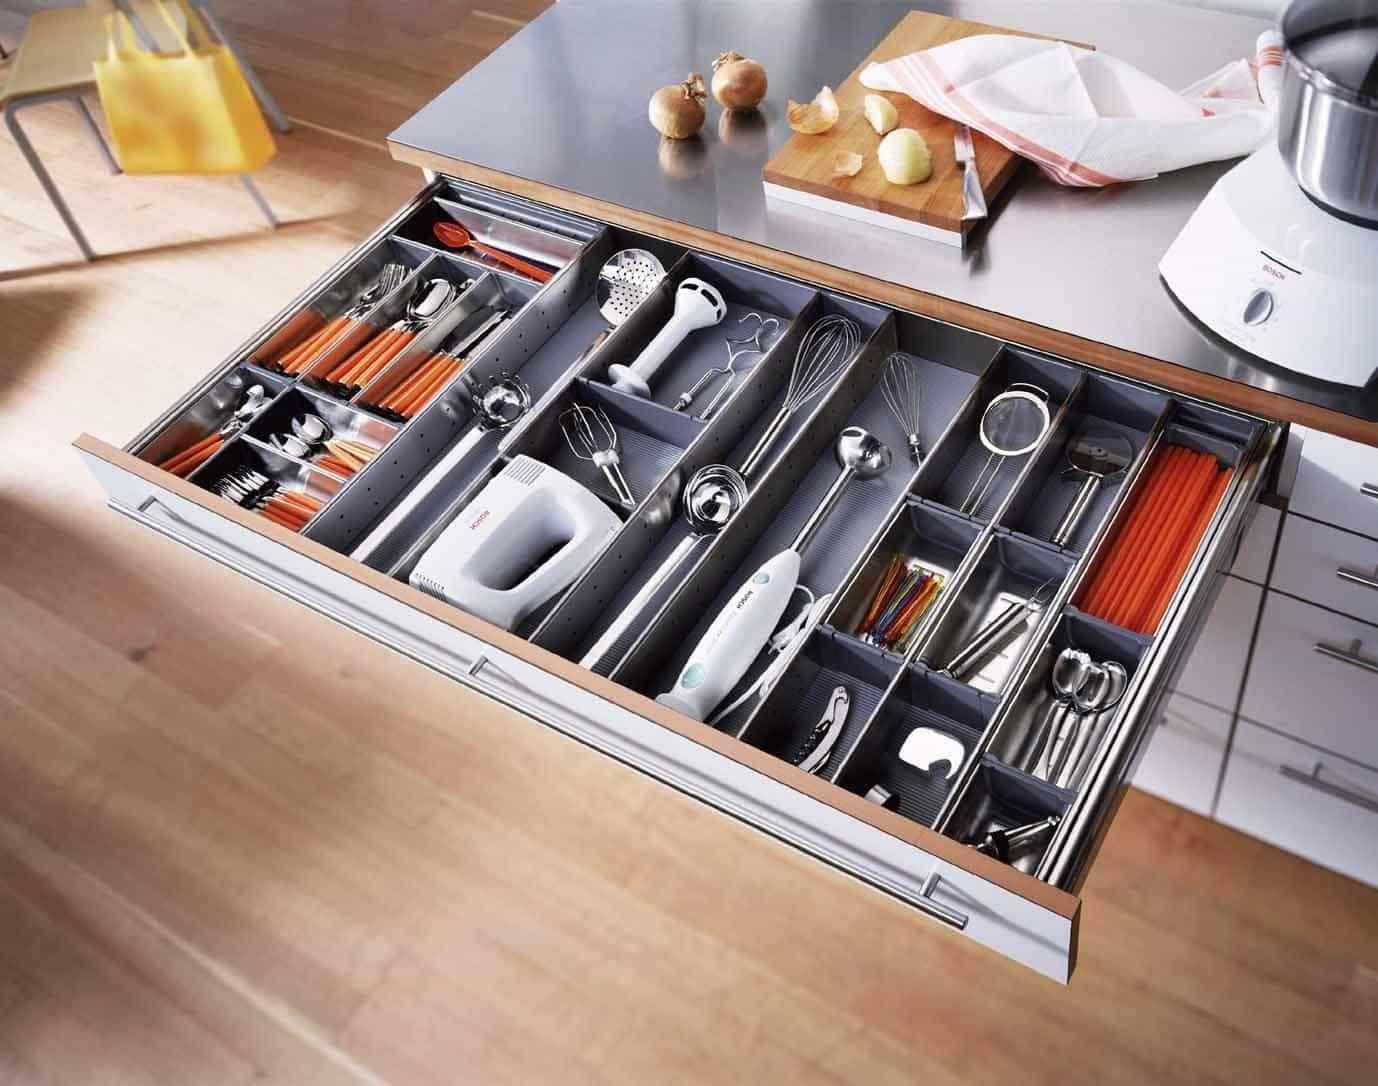 Best Kitchen Gallery: Modern Kitchen Cabi S With Drawer Dividers Modern Kitchen of Kitchen Cabinet Drawer Dividers on cal-ite.com